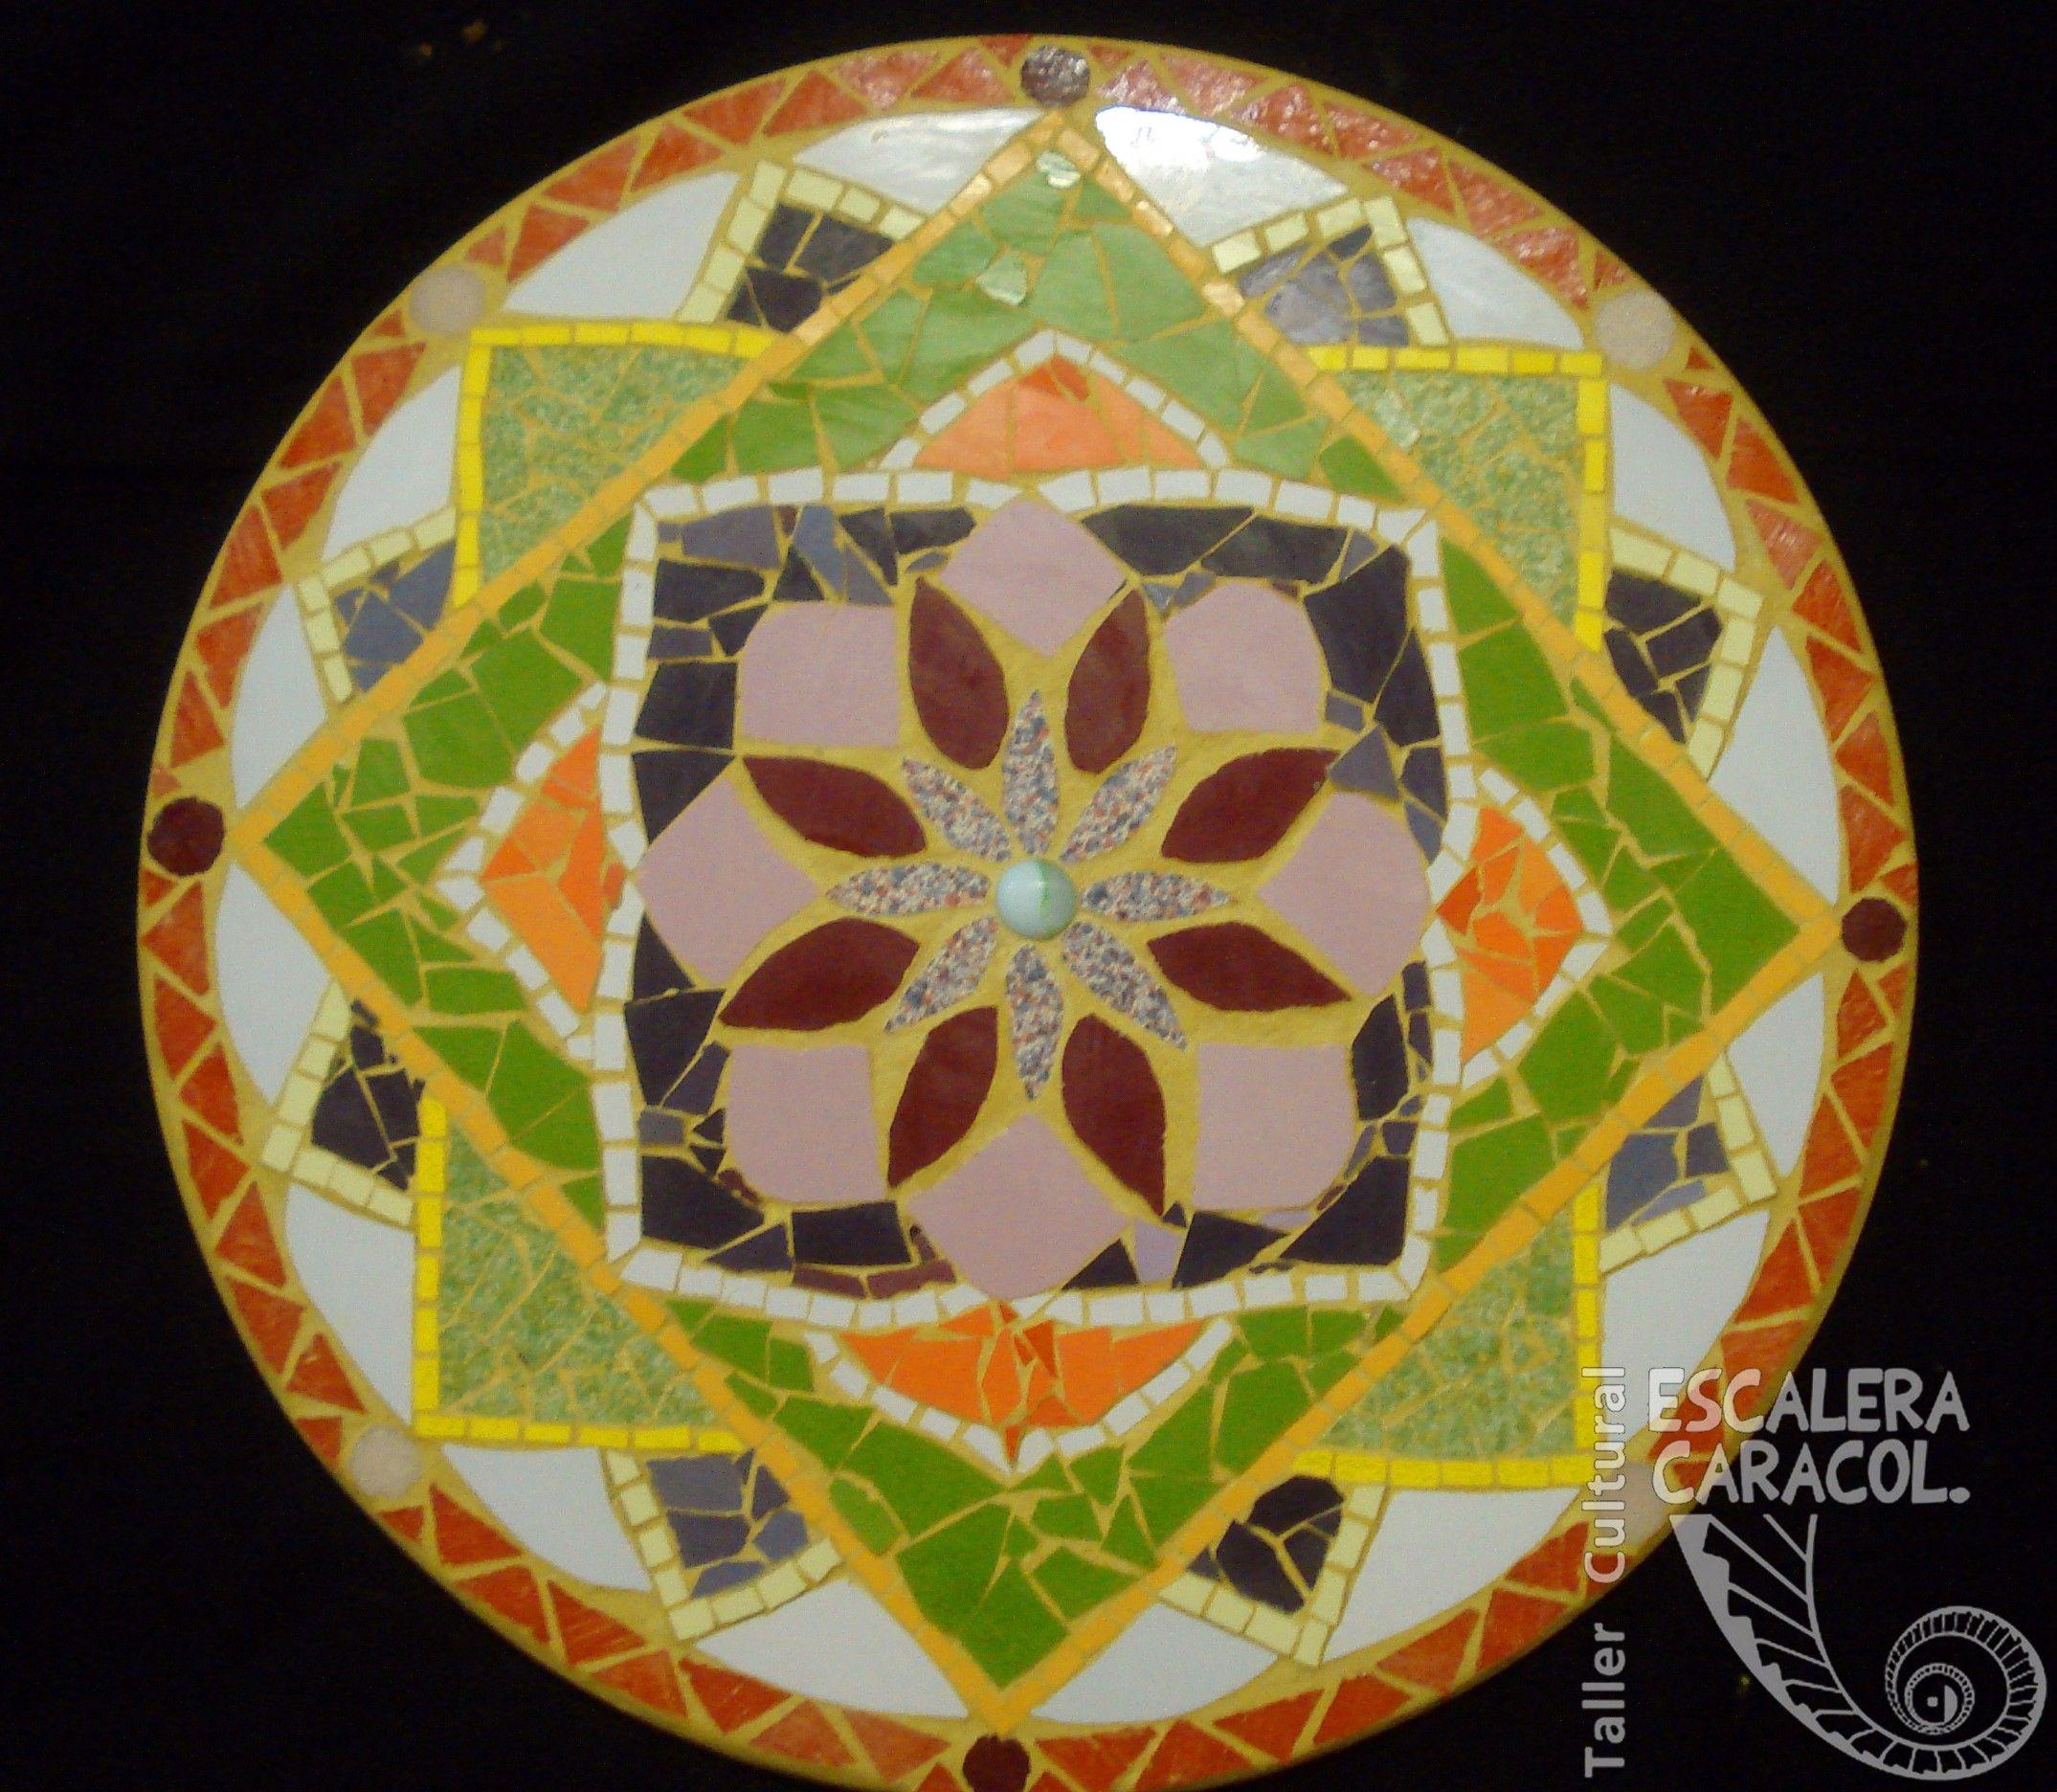 Mandala de mosaico de 40 cm de diámetro realizado por Alicia Pereyra. http://tallerescaleracaracol.com/artes-del-fuego/mosaico/mandalas/